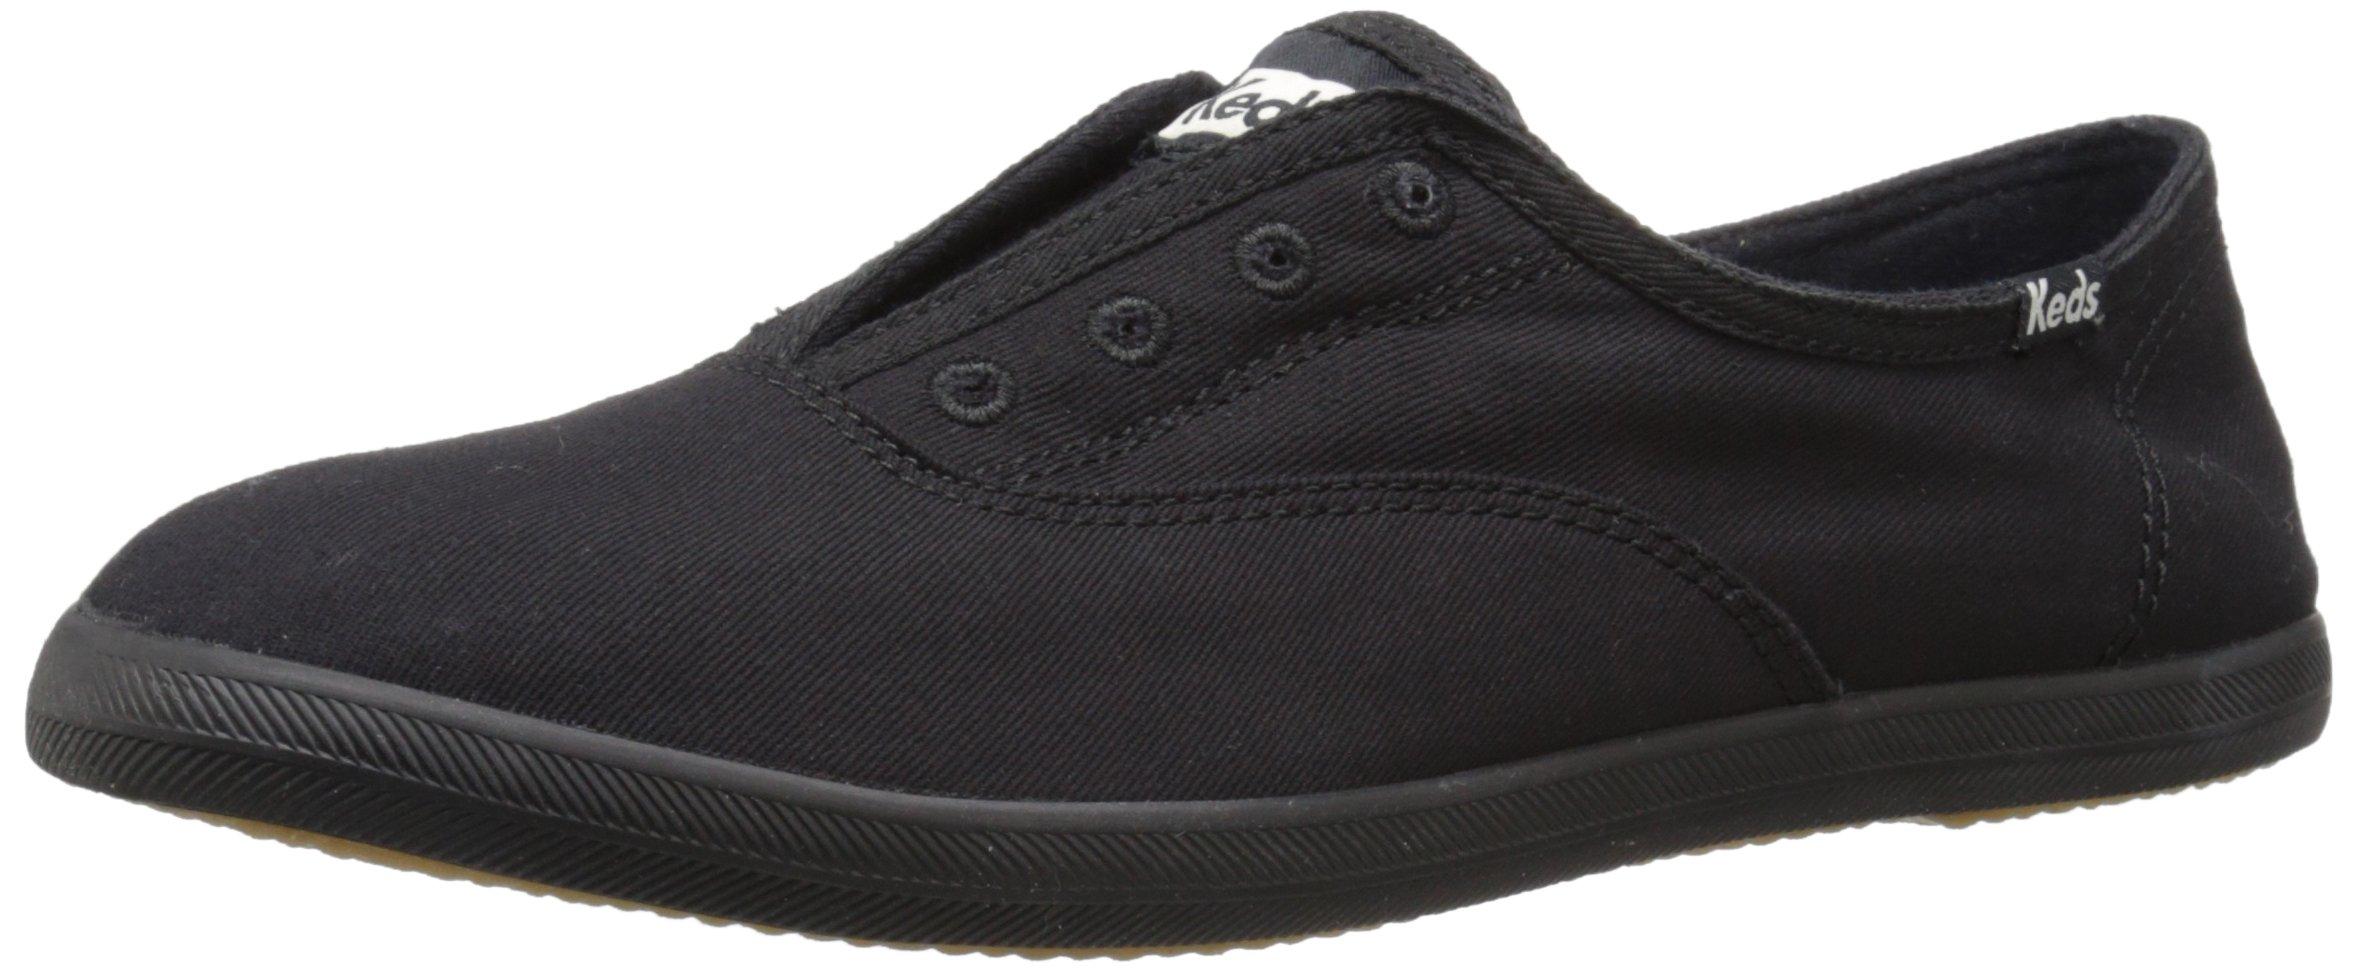 Keds Women's Chillax Fashion Sneaker, Black/Black, 5.5 M US